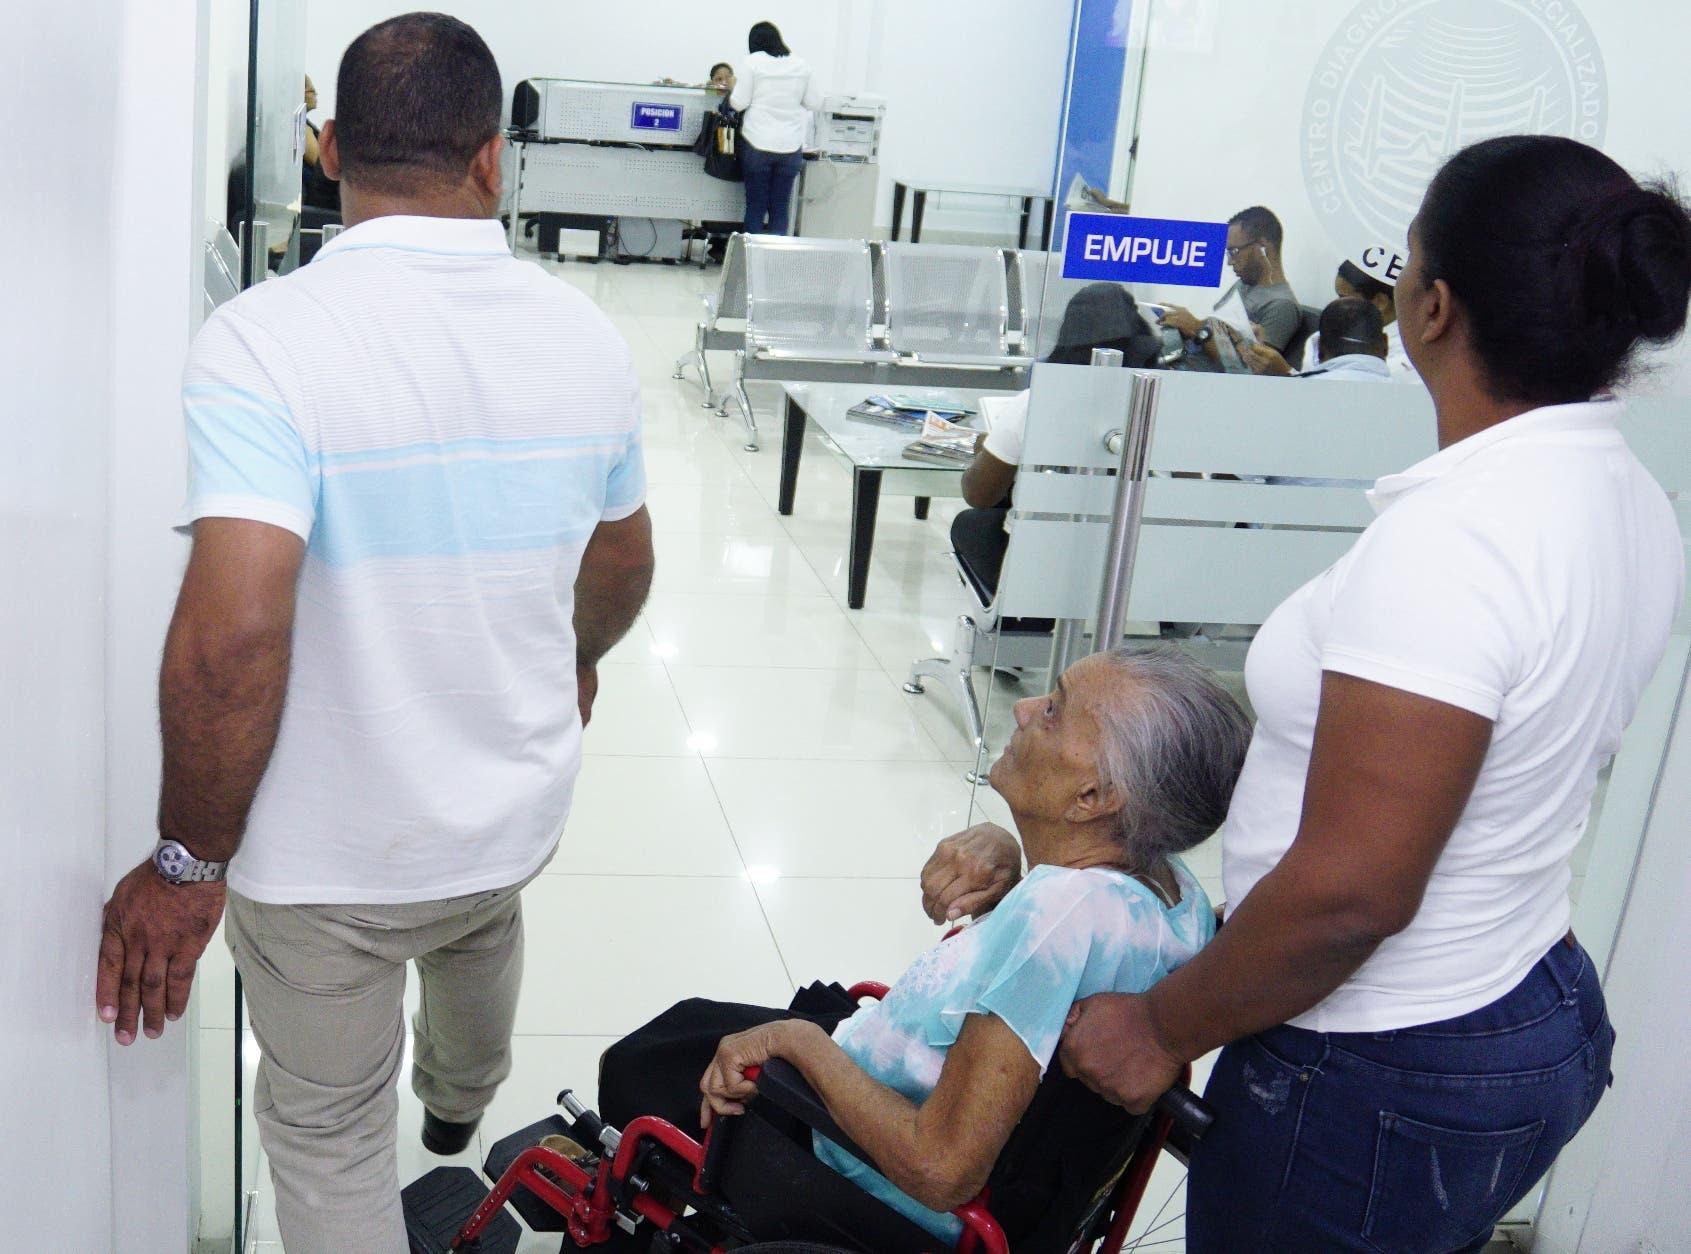 Cada día miles de pacientes acuden a los centros de diagnósticos para realizarse diversos análisis médicos.  ELIESER TAPIA